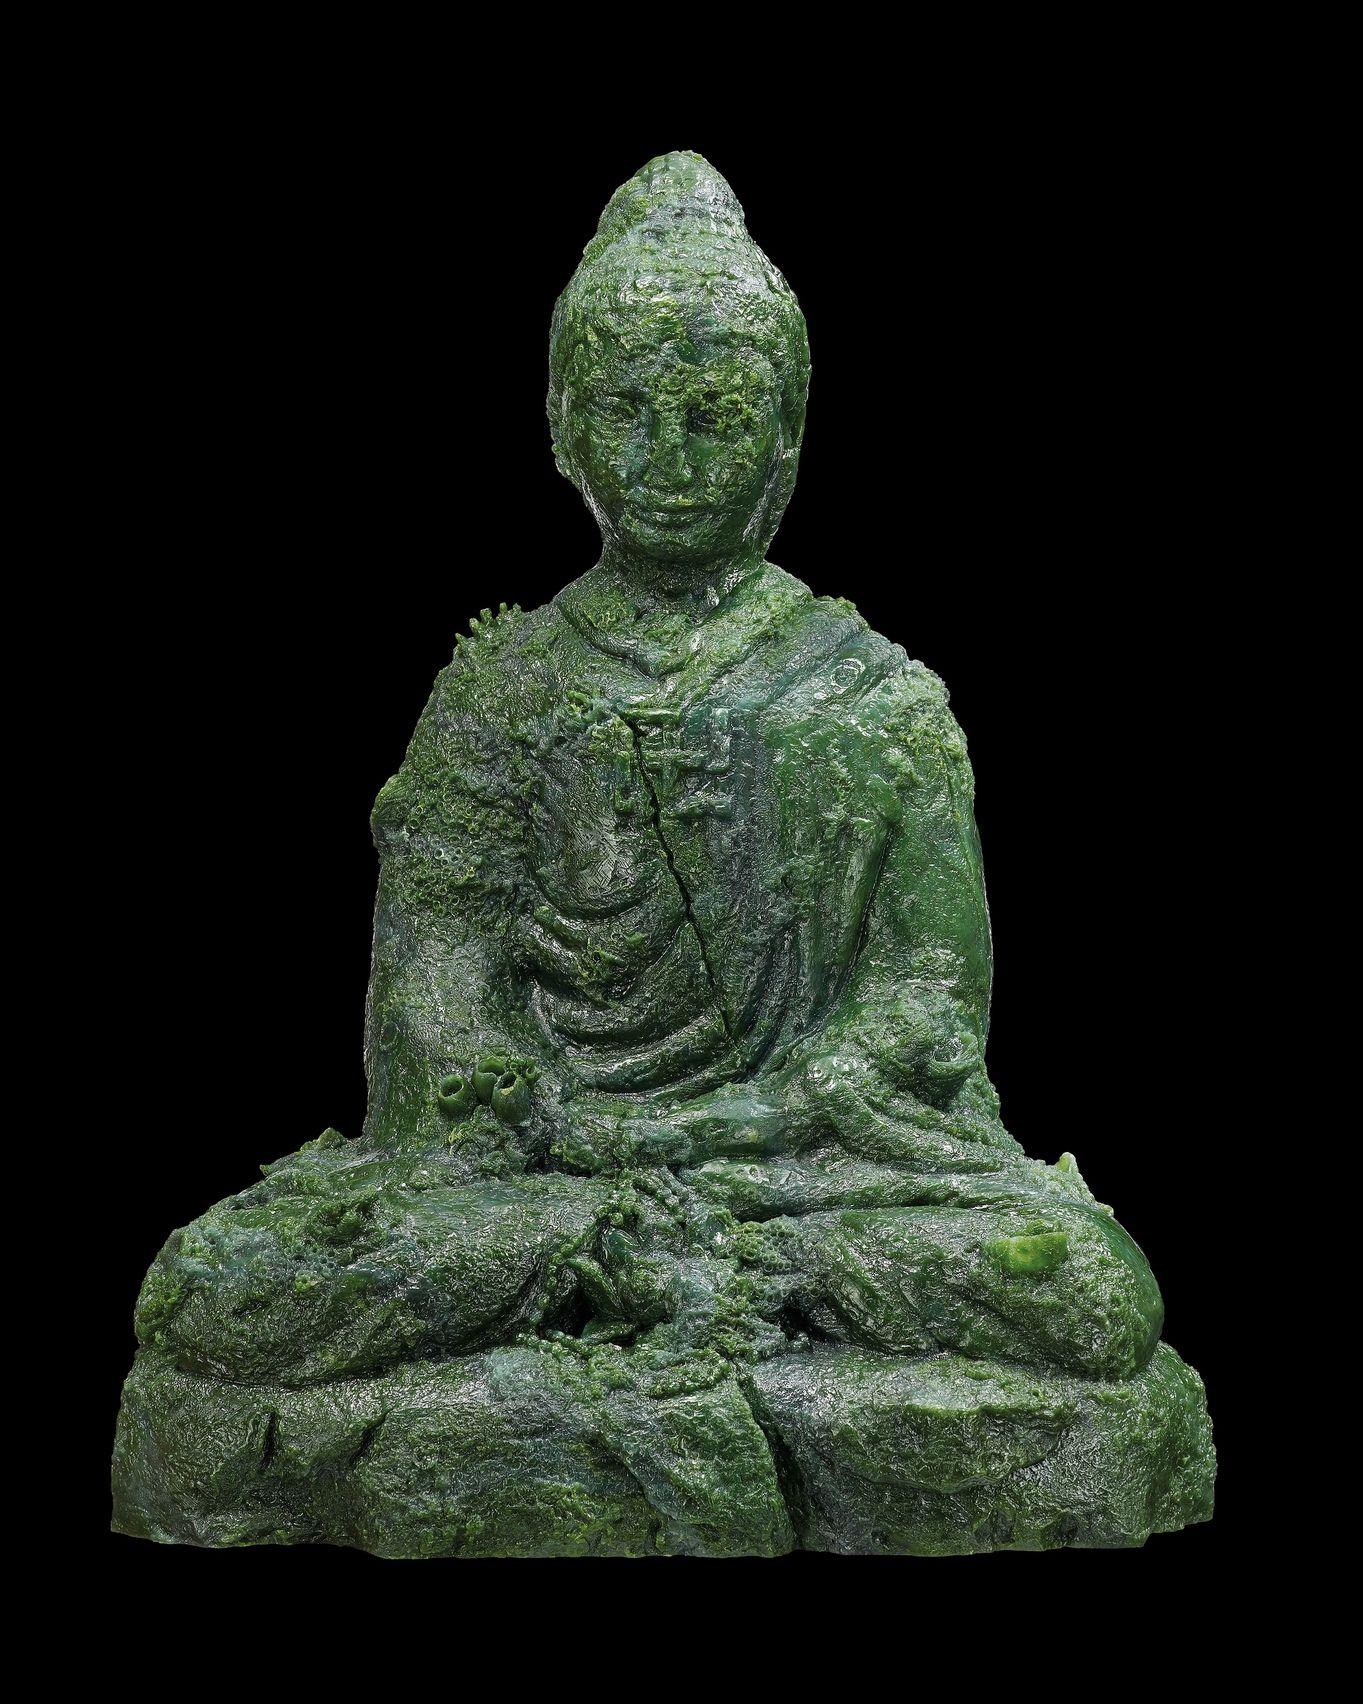 jade-buddha-1511780526.jpg